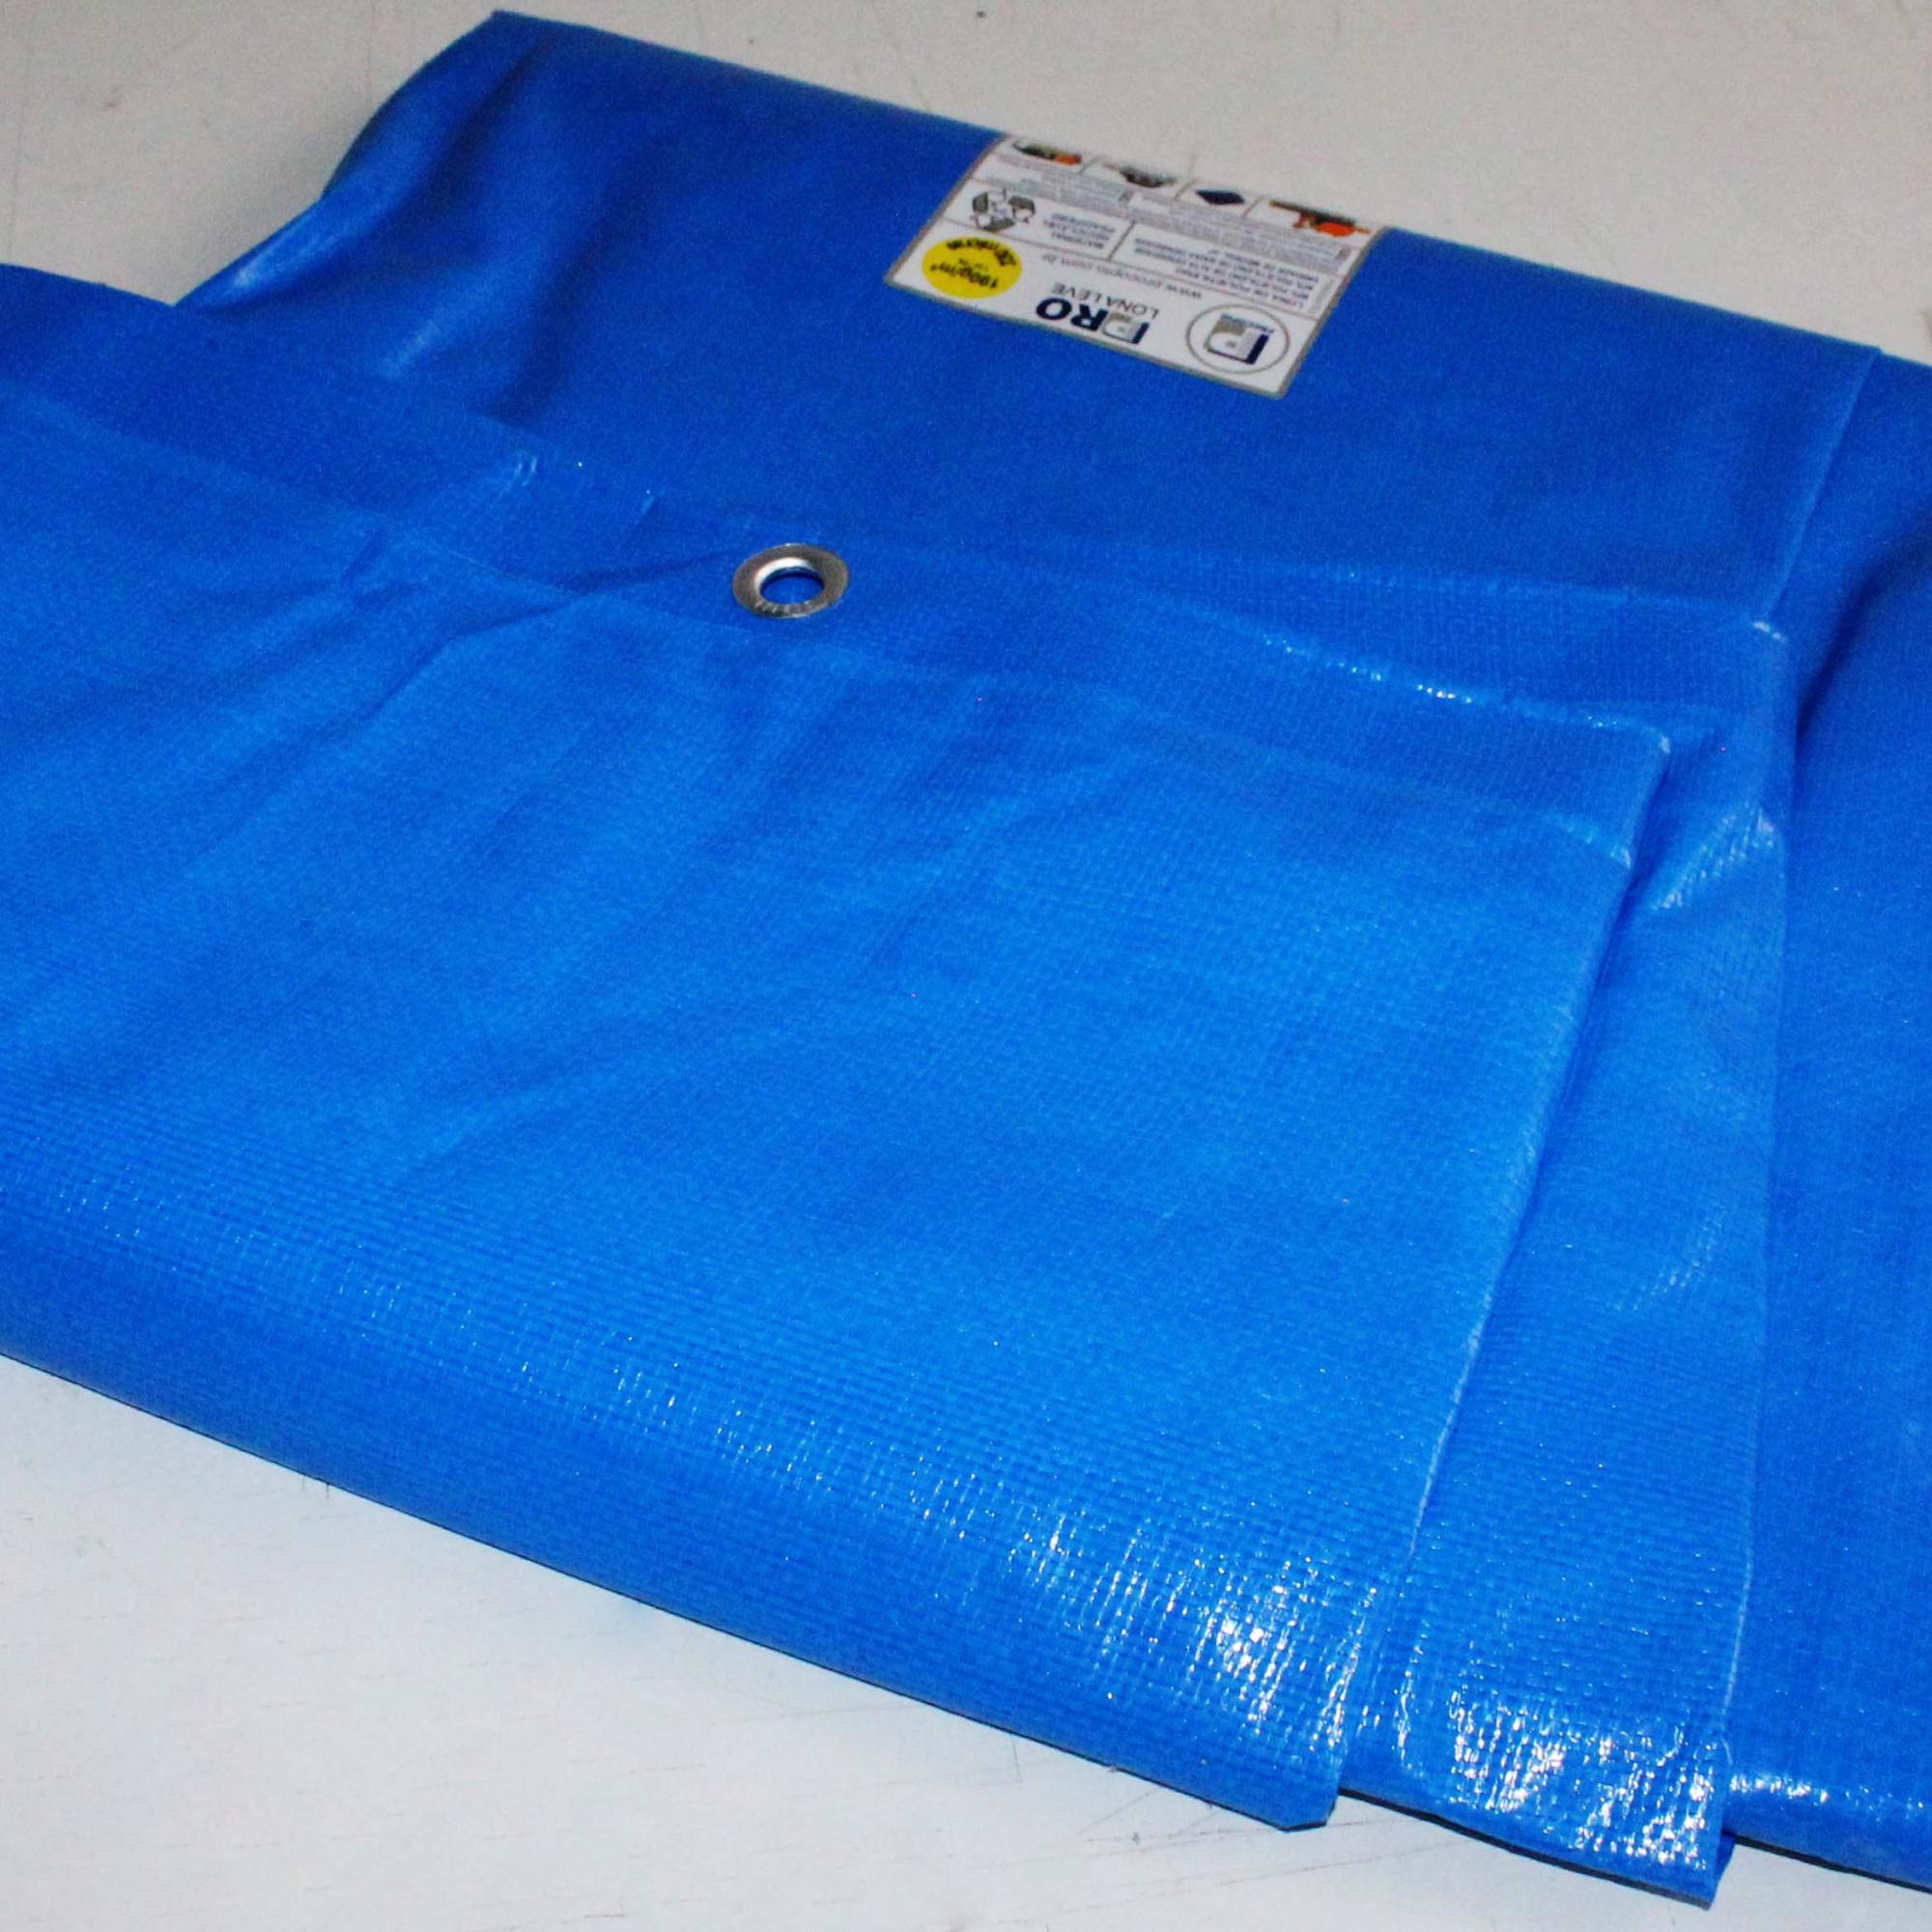 Prolona leve agric azul 2x3m